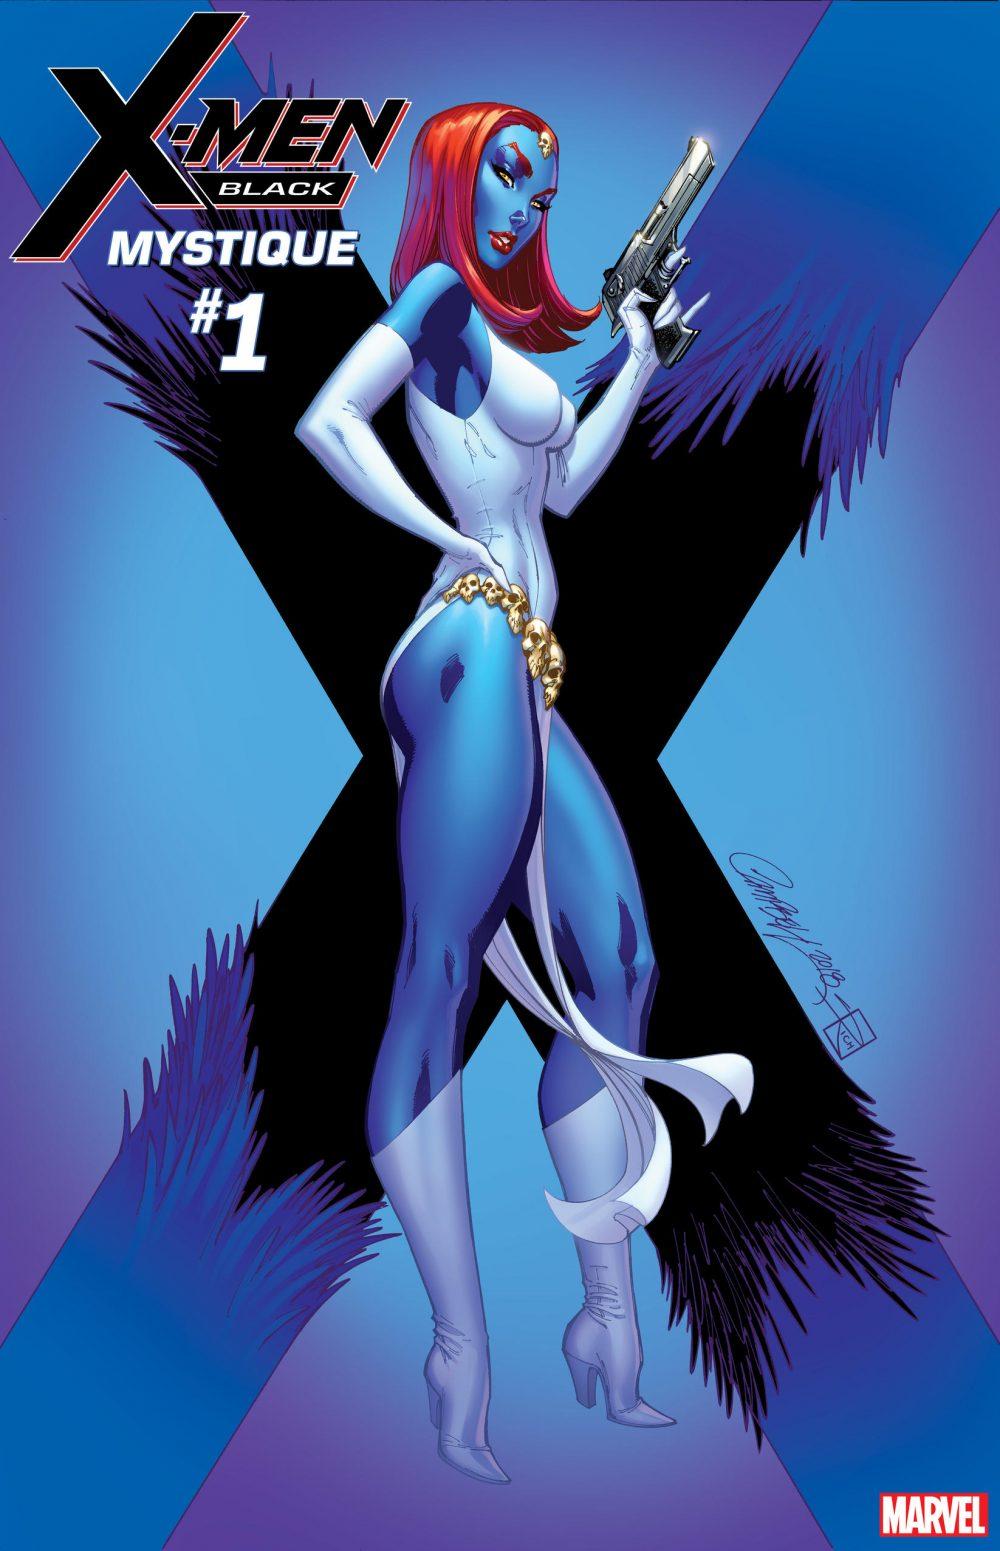 X-Men: Black - Mystique